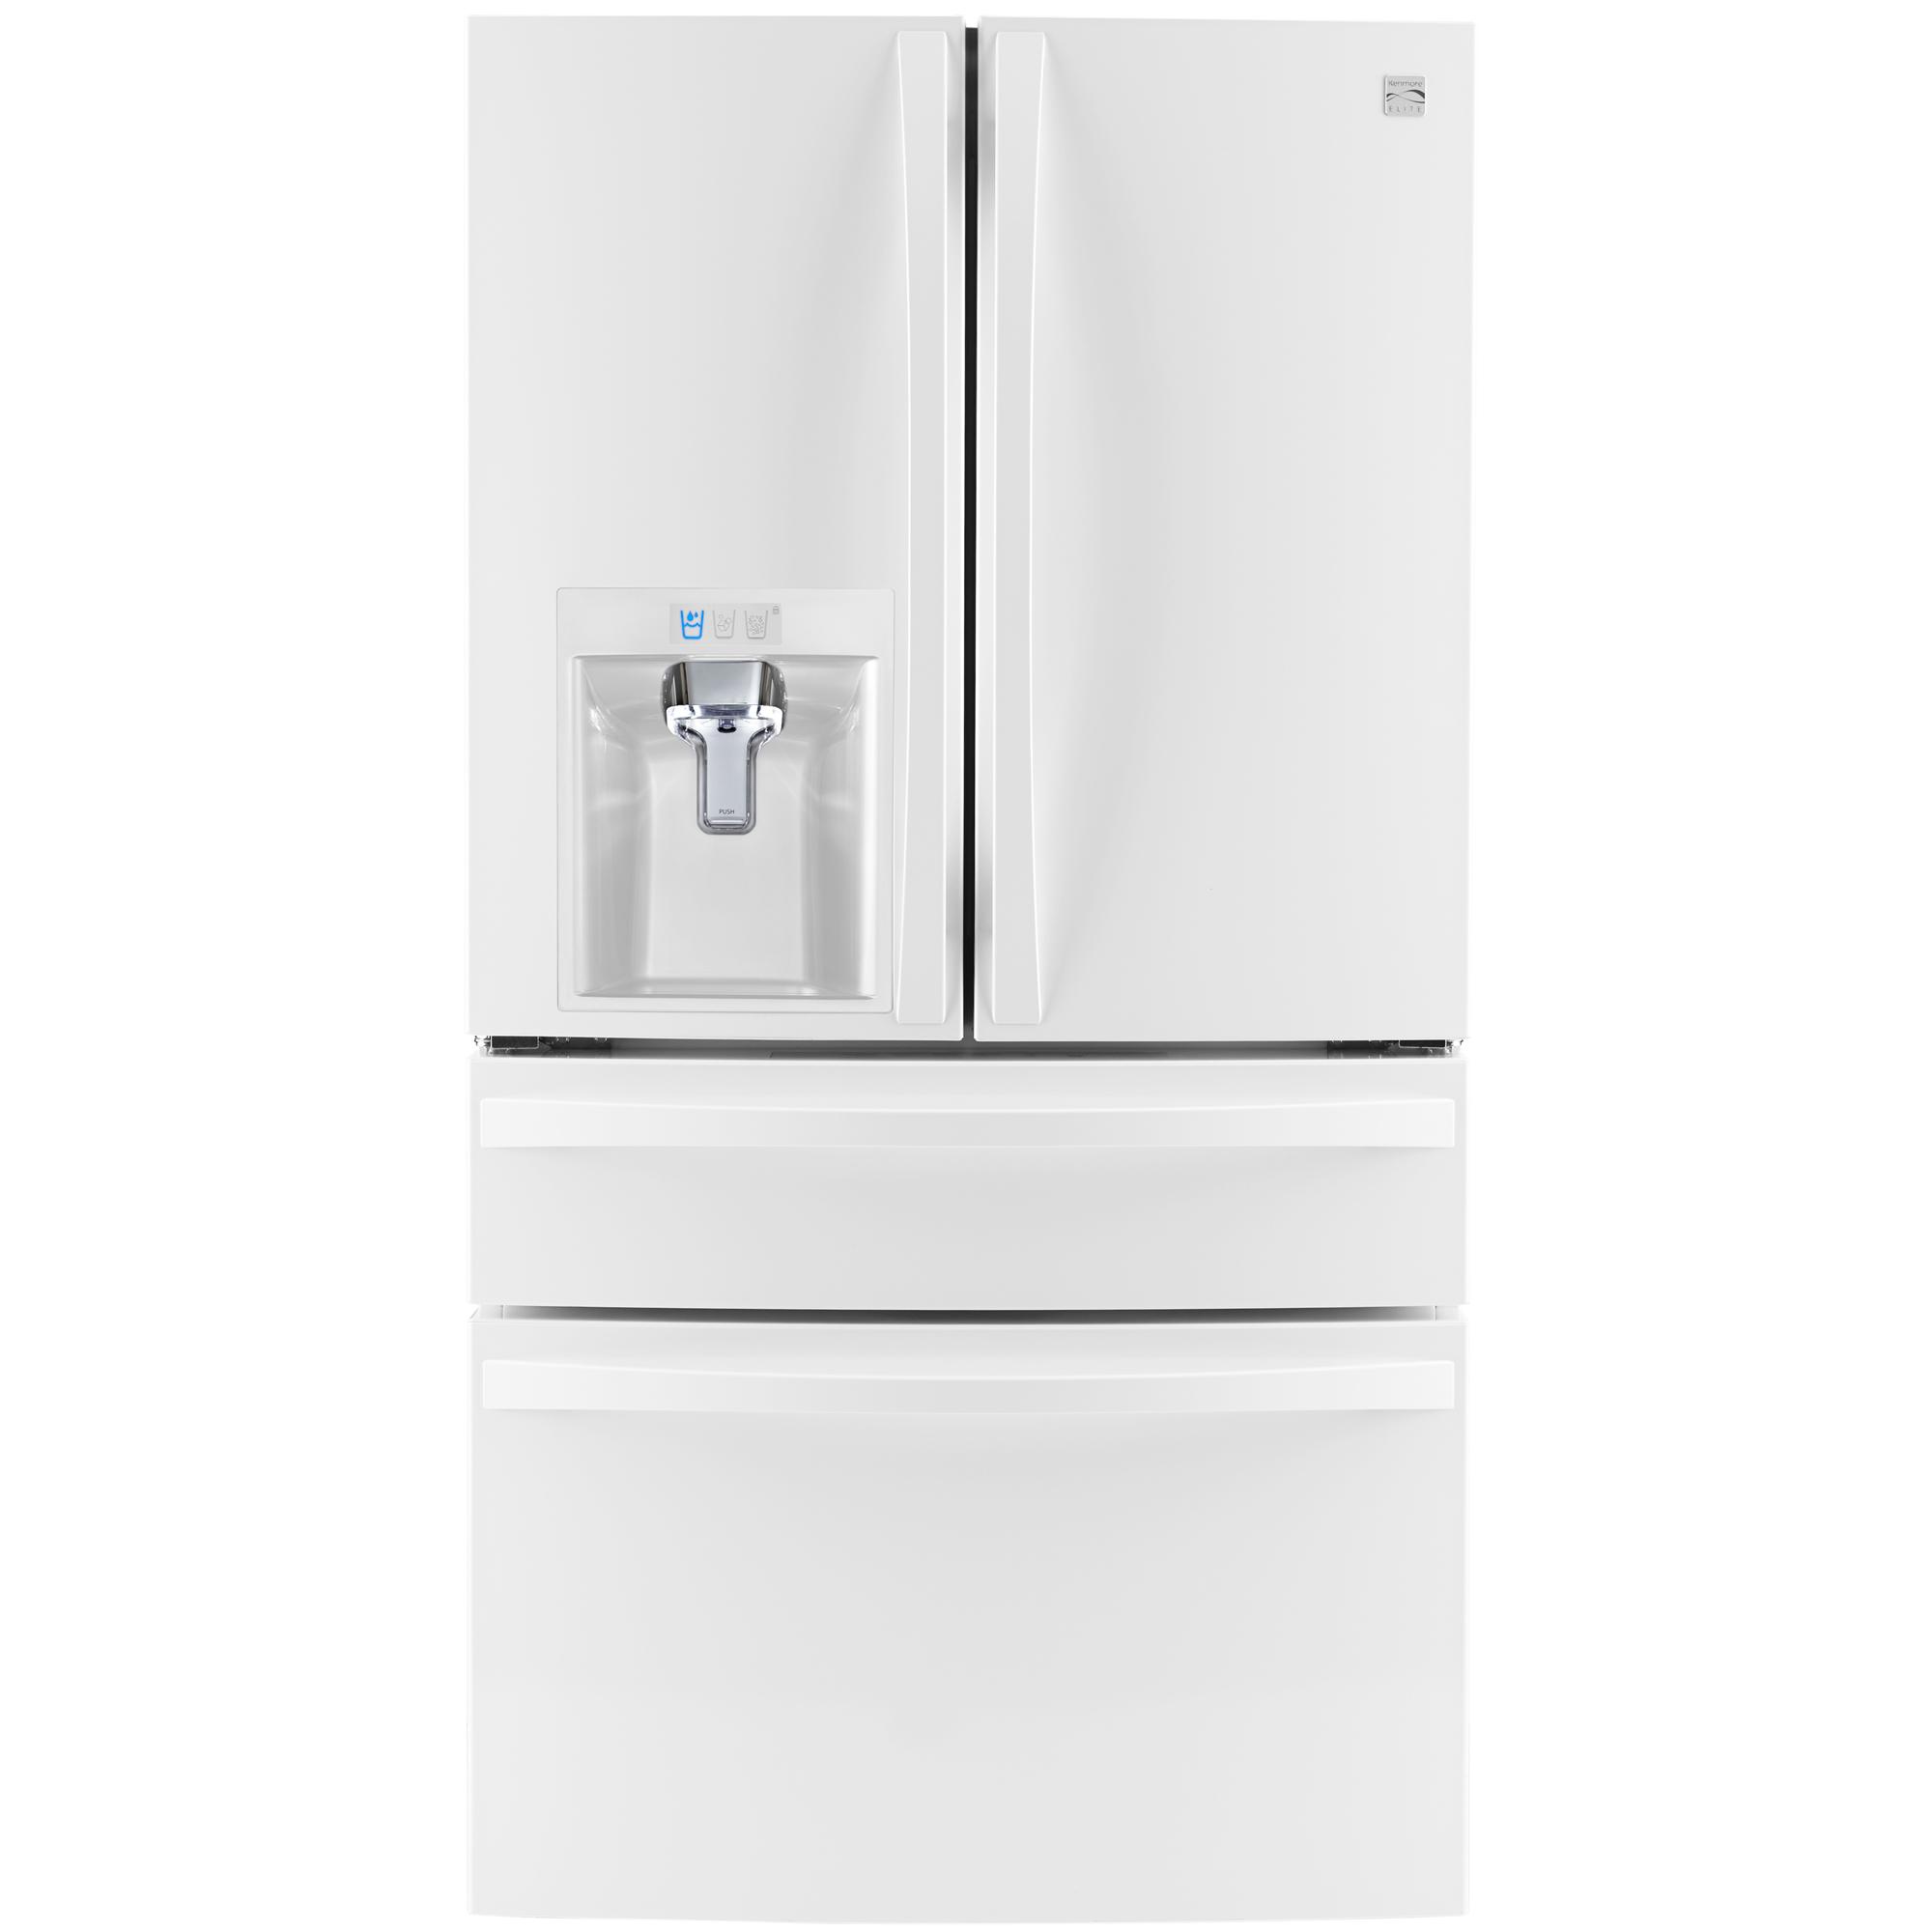 kenmore elite bottom freezer refrigerator model 795 manual